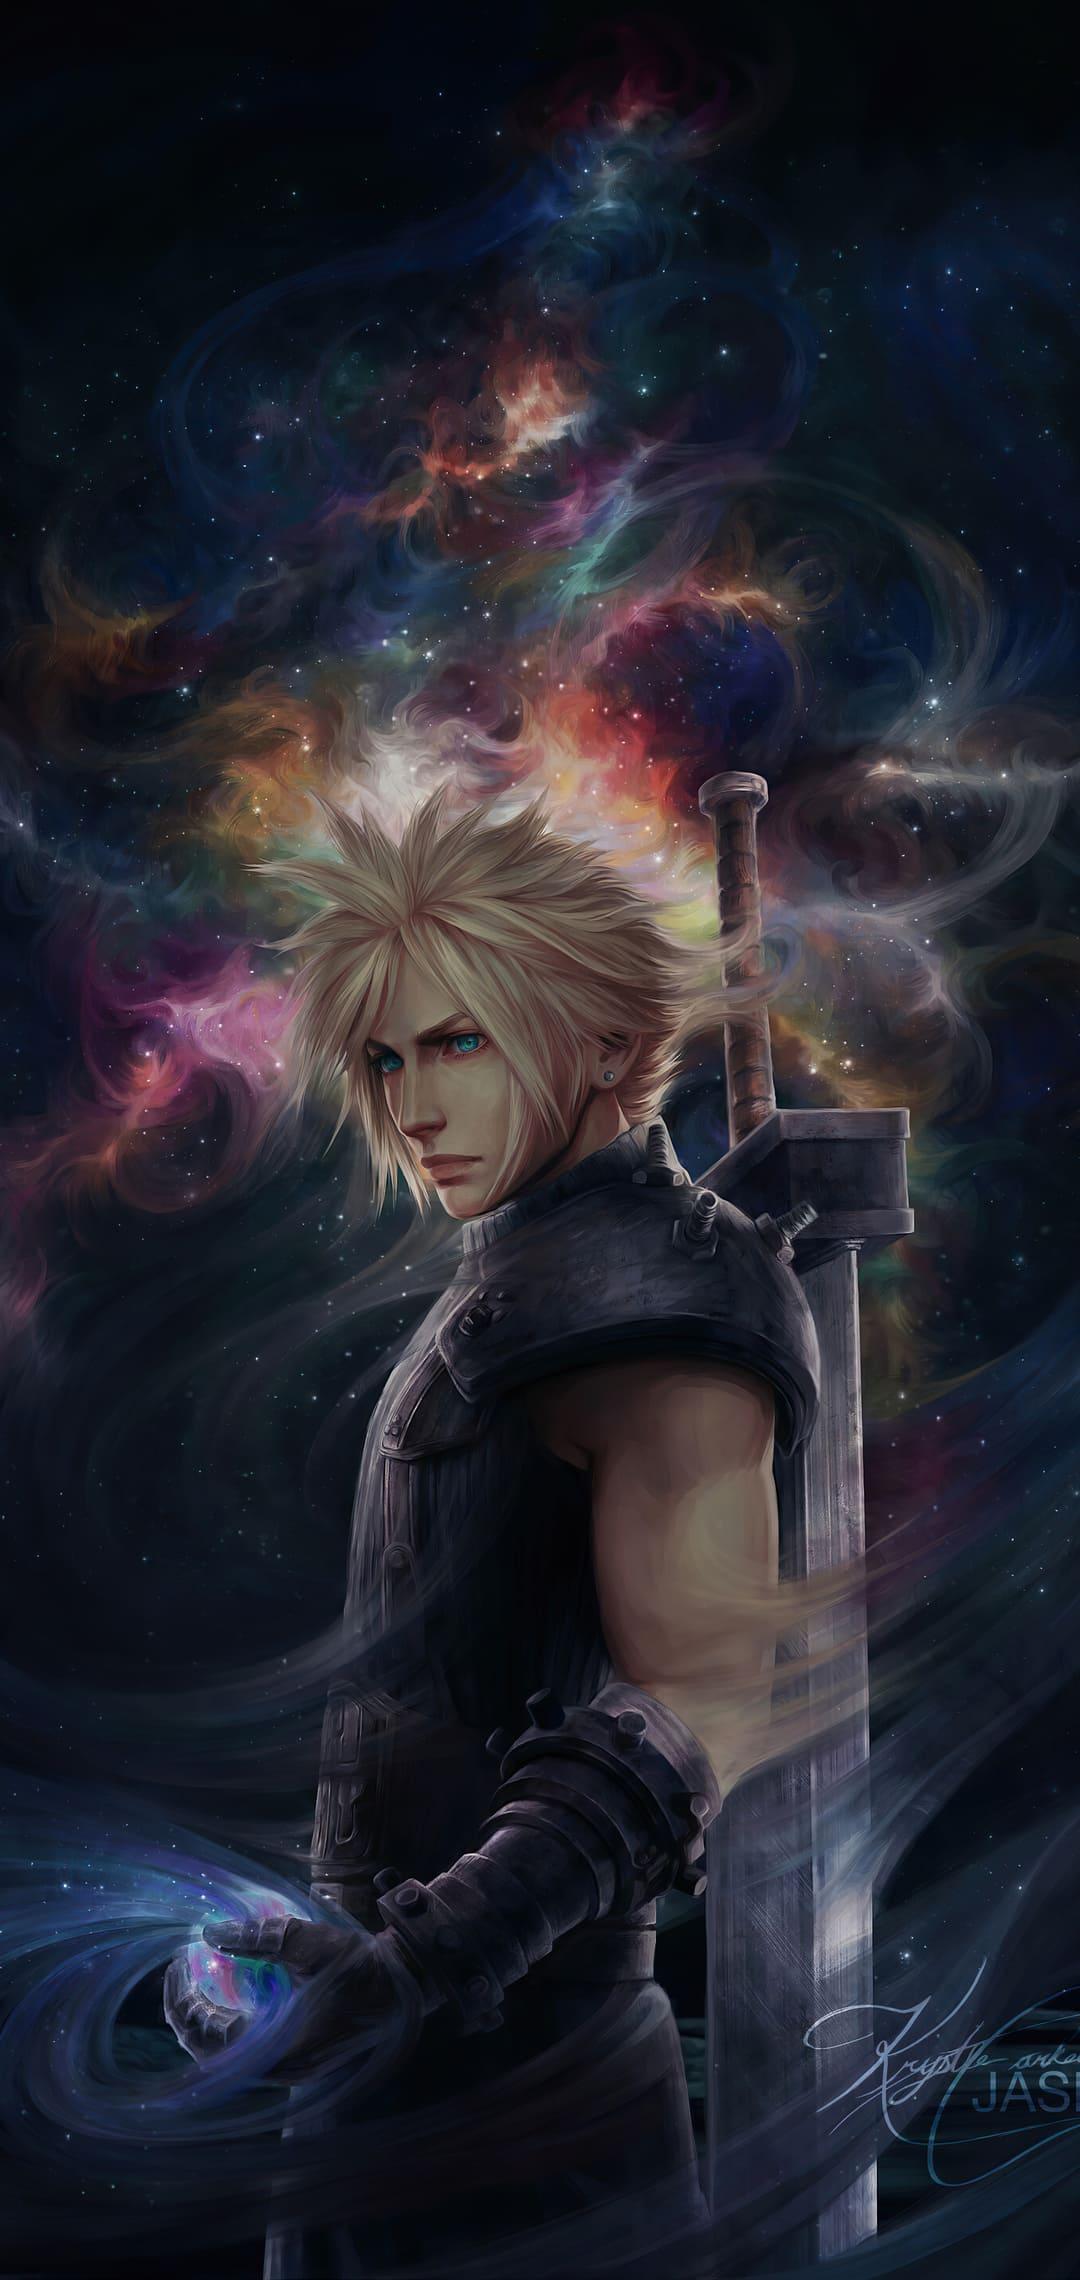 Final Fantasy VII Wallpapers - Top 4K Background Download